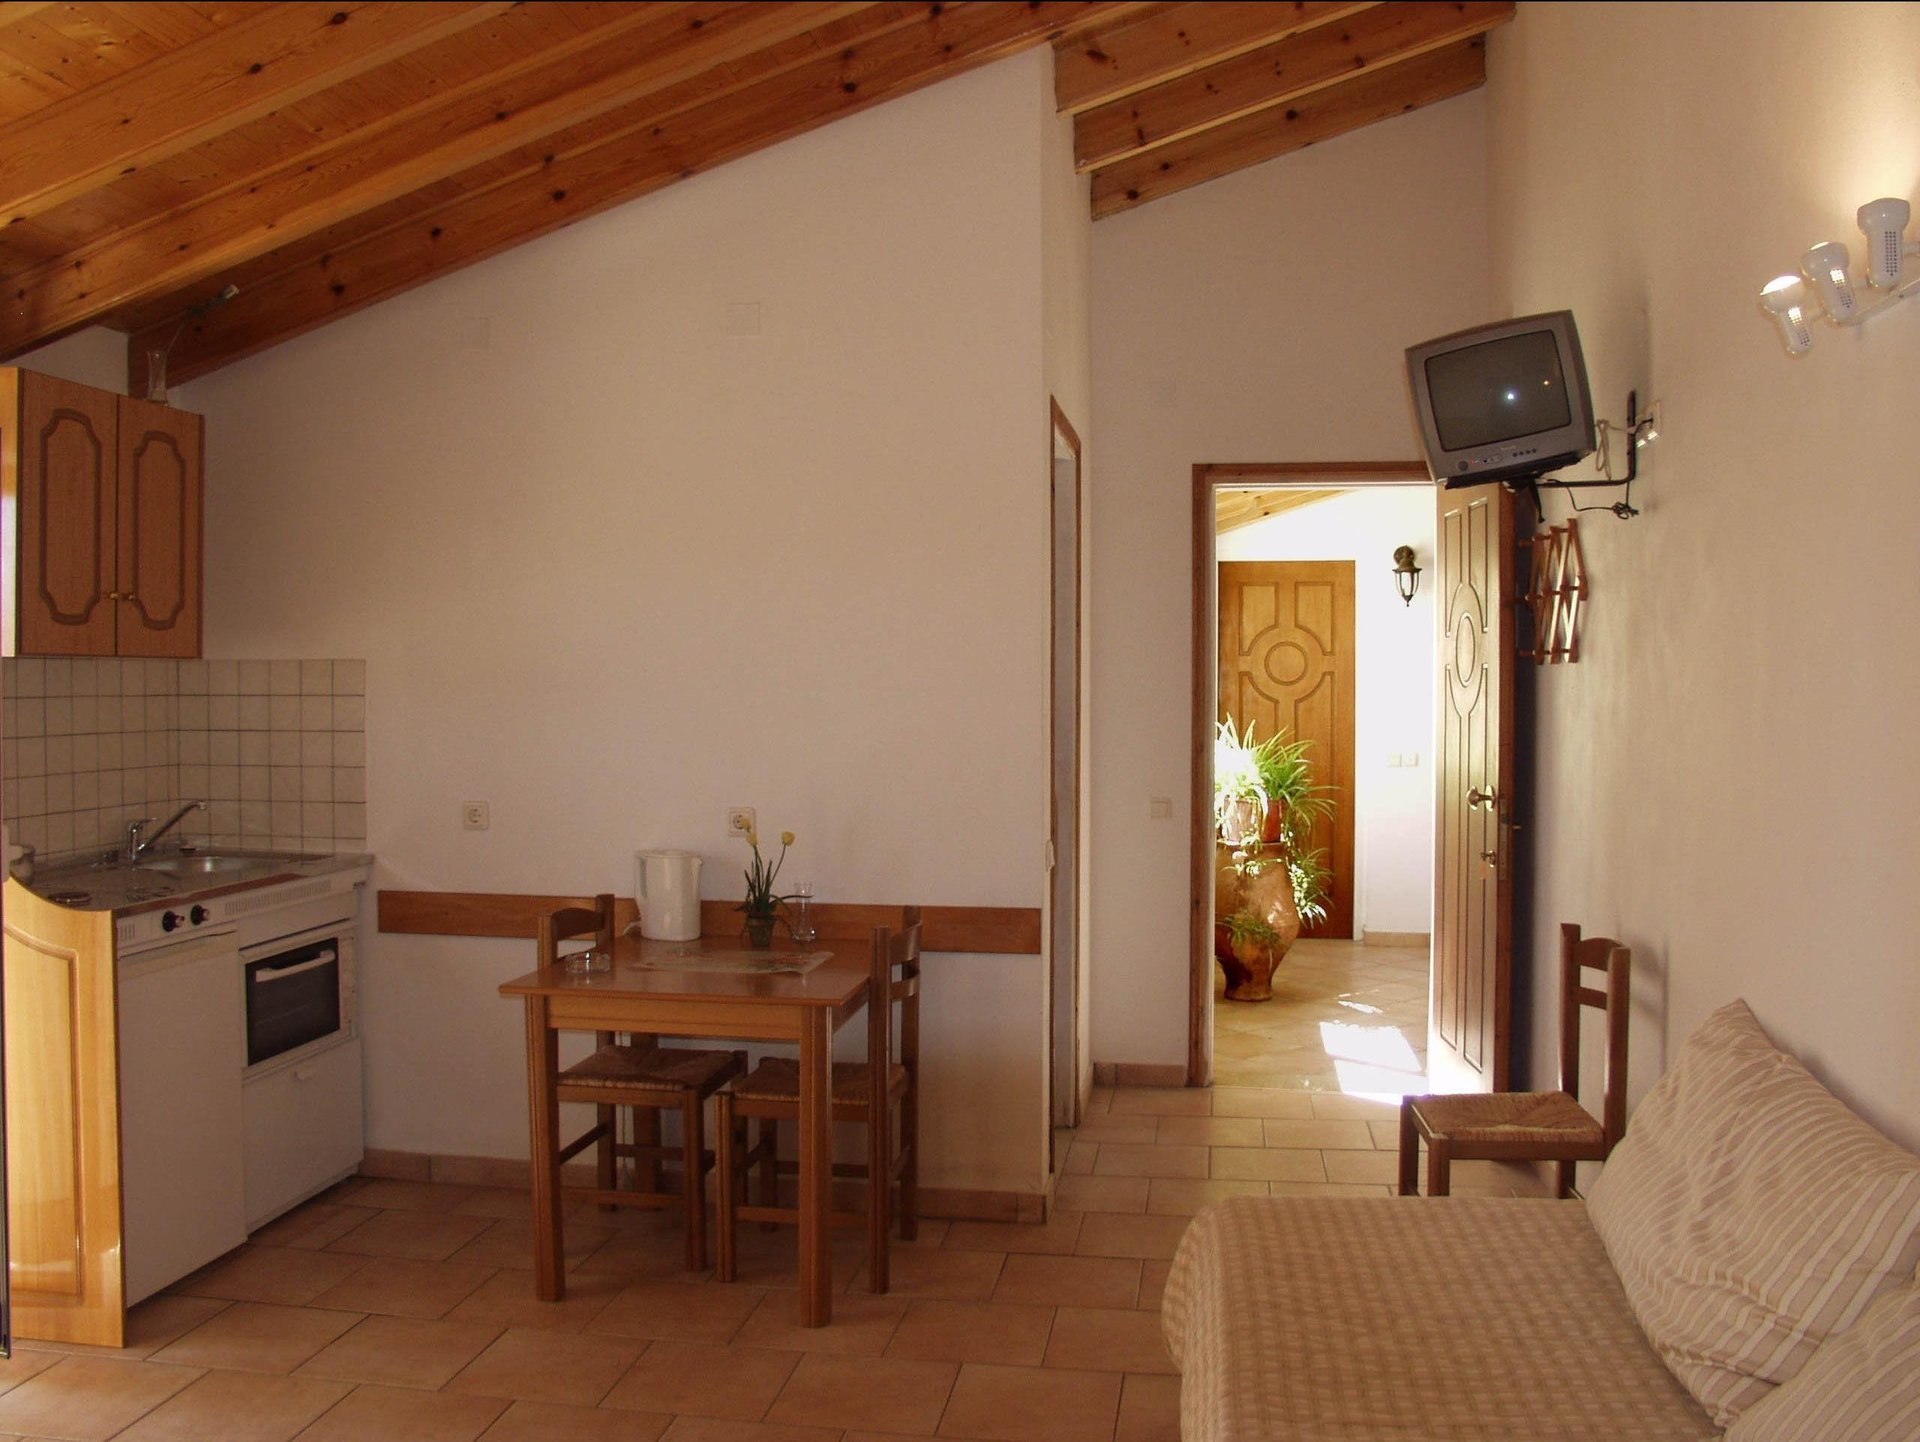 Gerekos - 2-kamer appartement